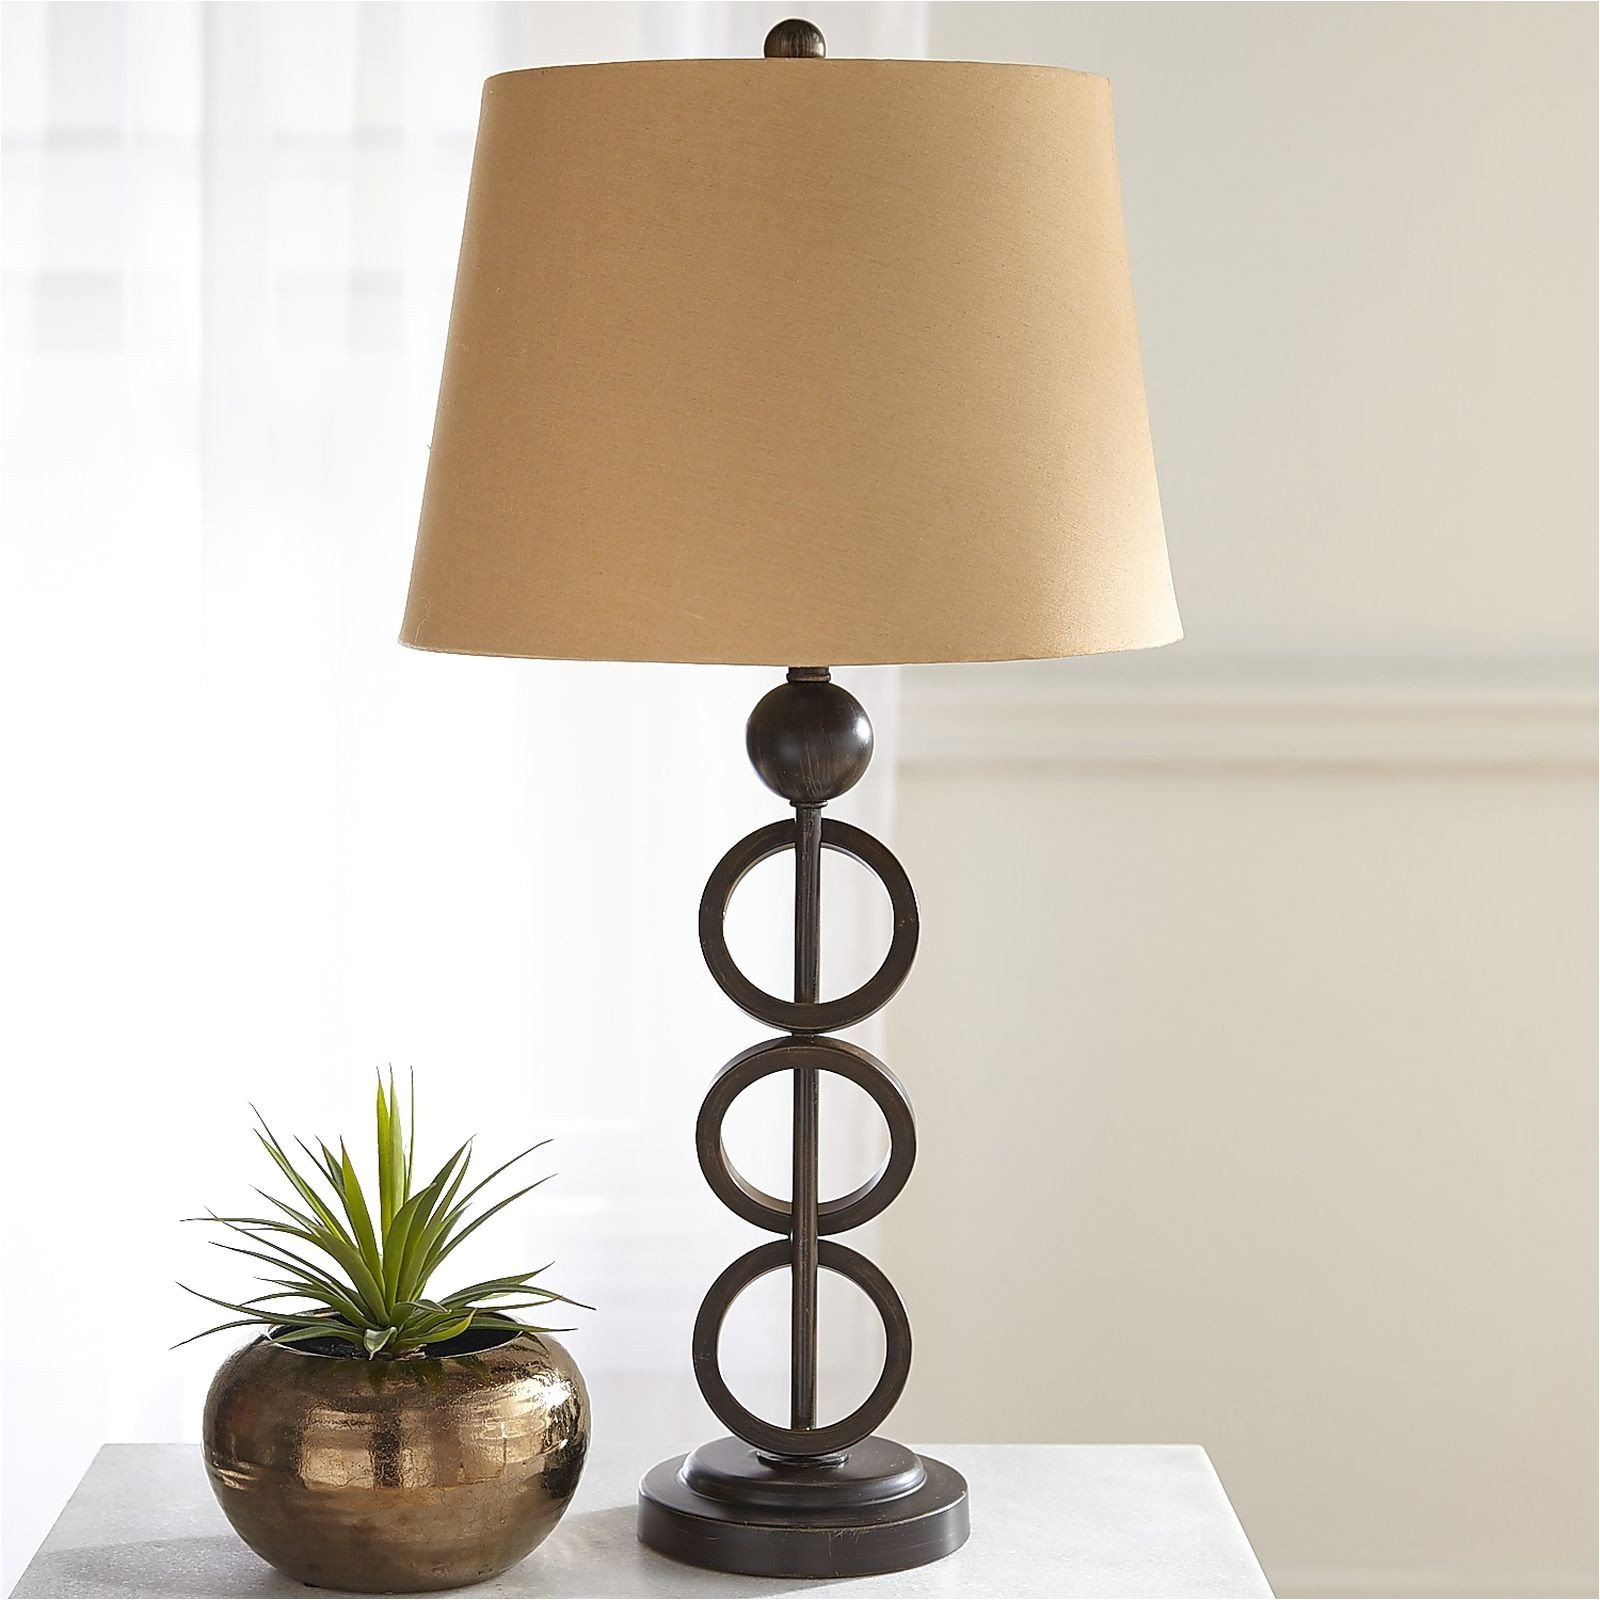 Mustard Yellow Floor Lamp 15 Fresh Girls Table Lamp Wonderfull Lighting World